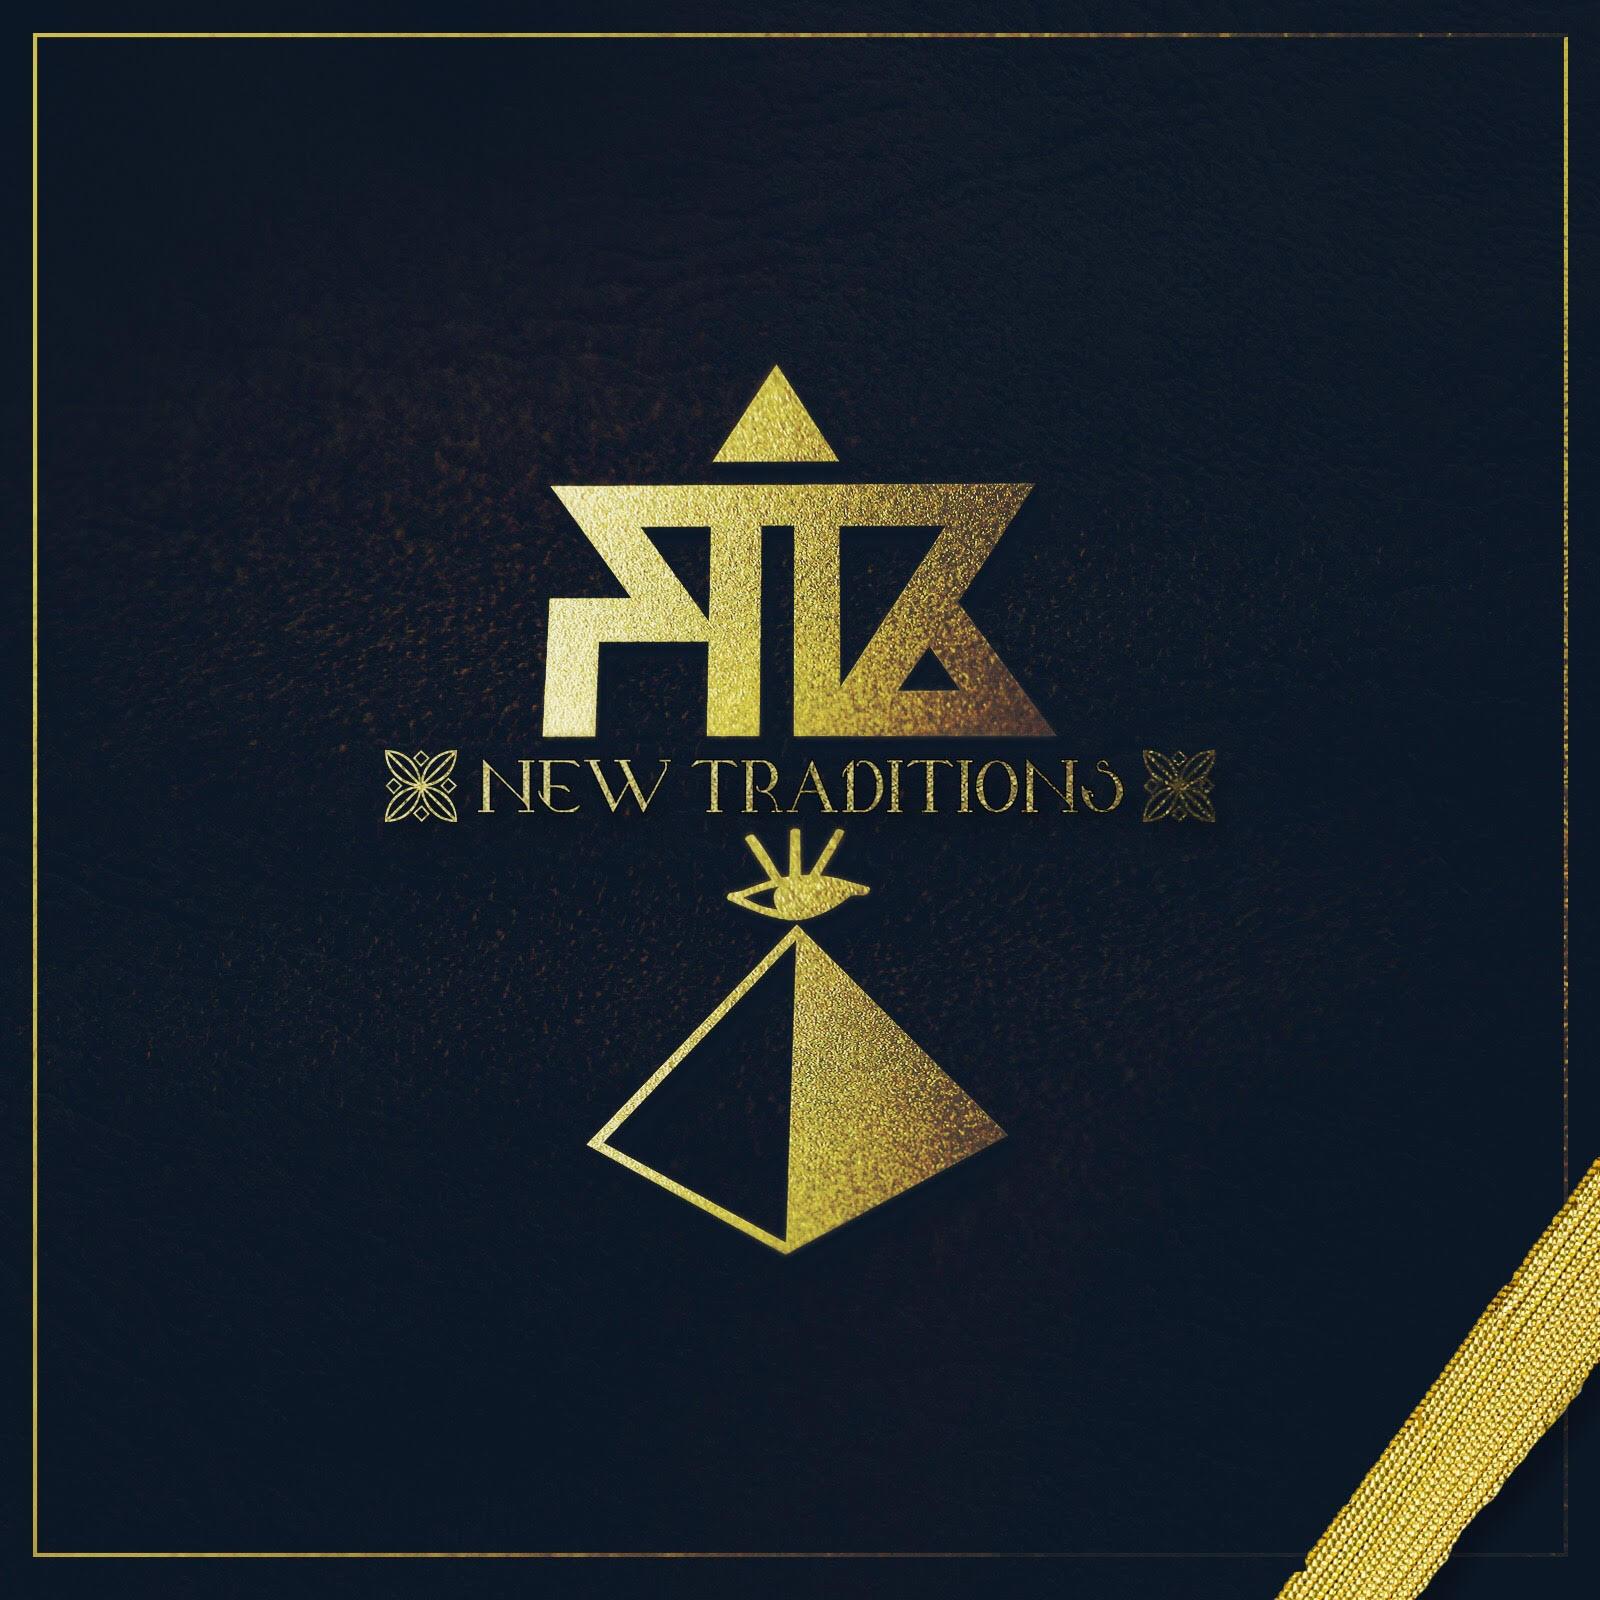 New Music: Fitz Taylor – New Tradition | @FitzTaylor @SemajForeman